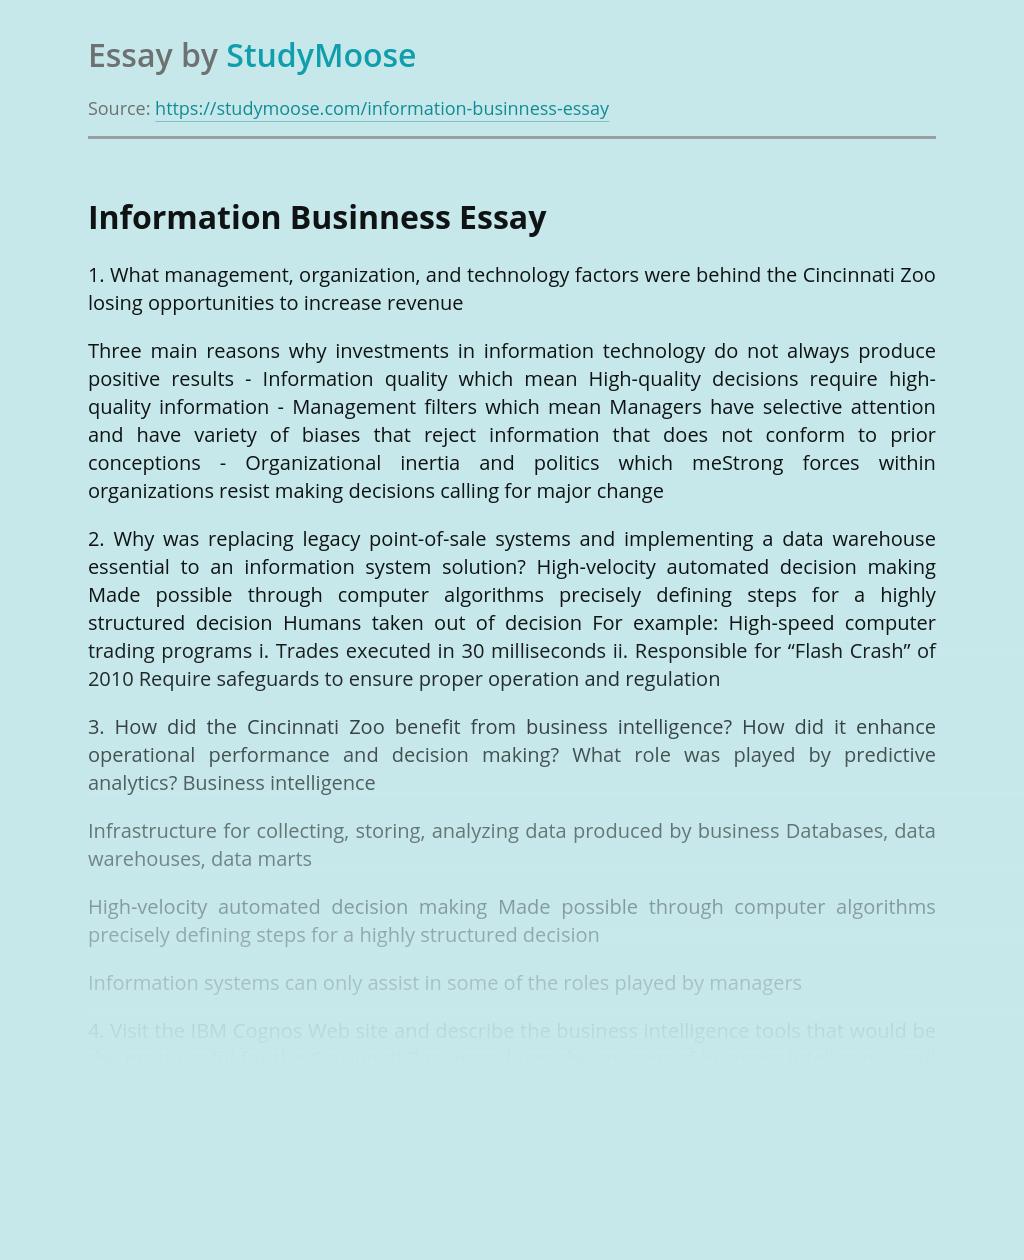 Information Businness